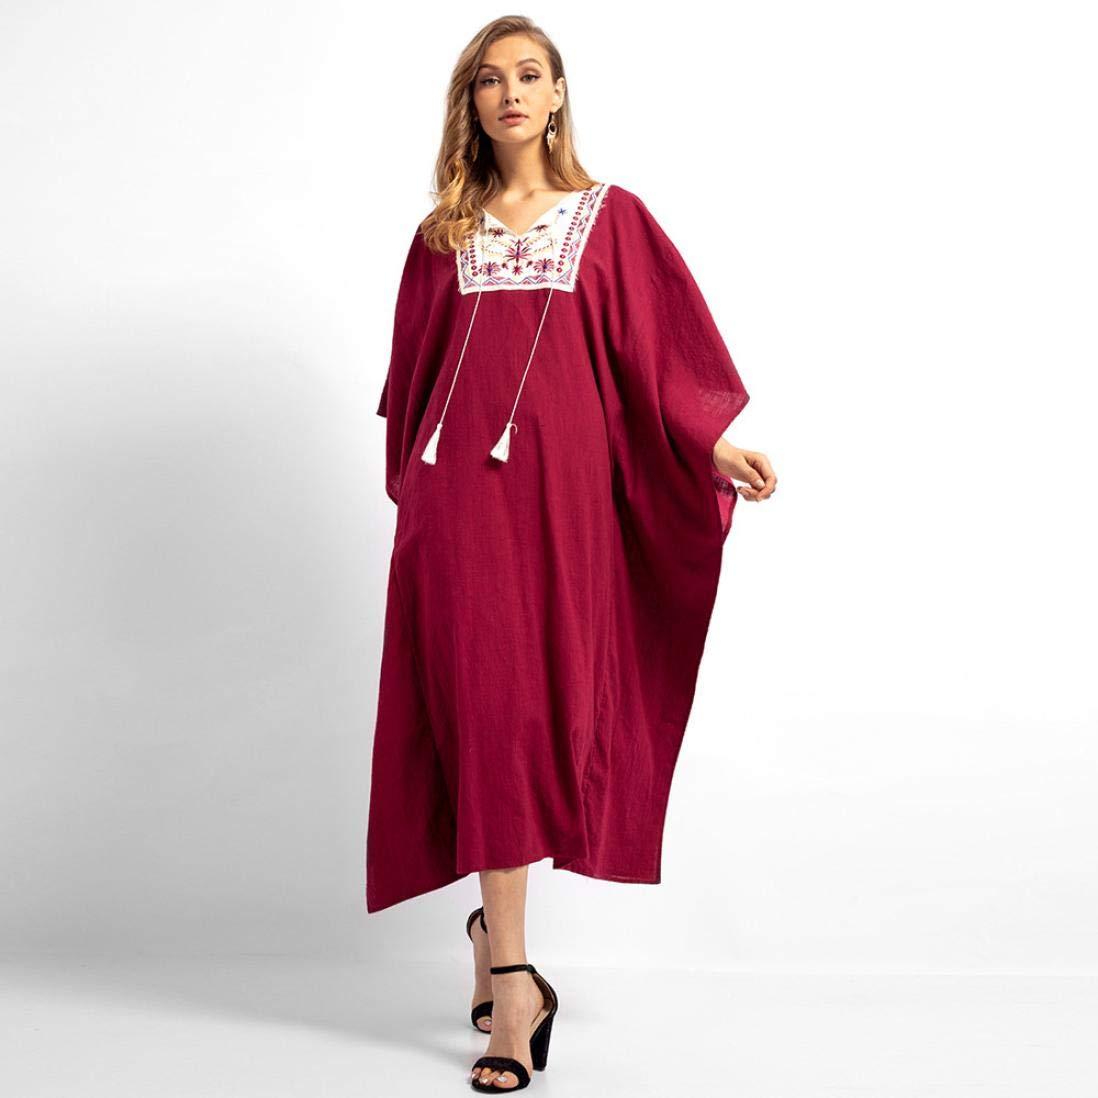 750b2c22982 Gergeos Women Robe Embroidery Tassel V-Neck Long Sleeves Cotton Maxi Dresses  at Amazon Women s Clothing store